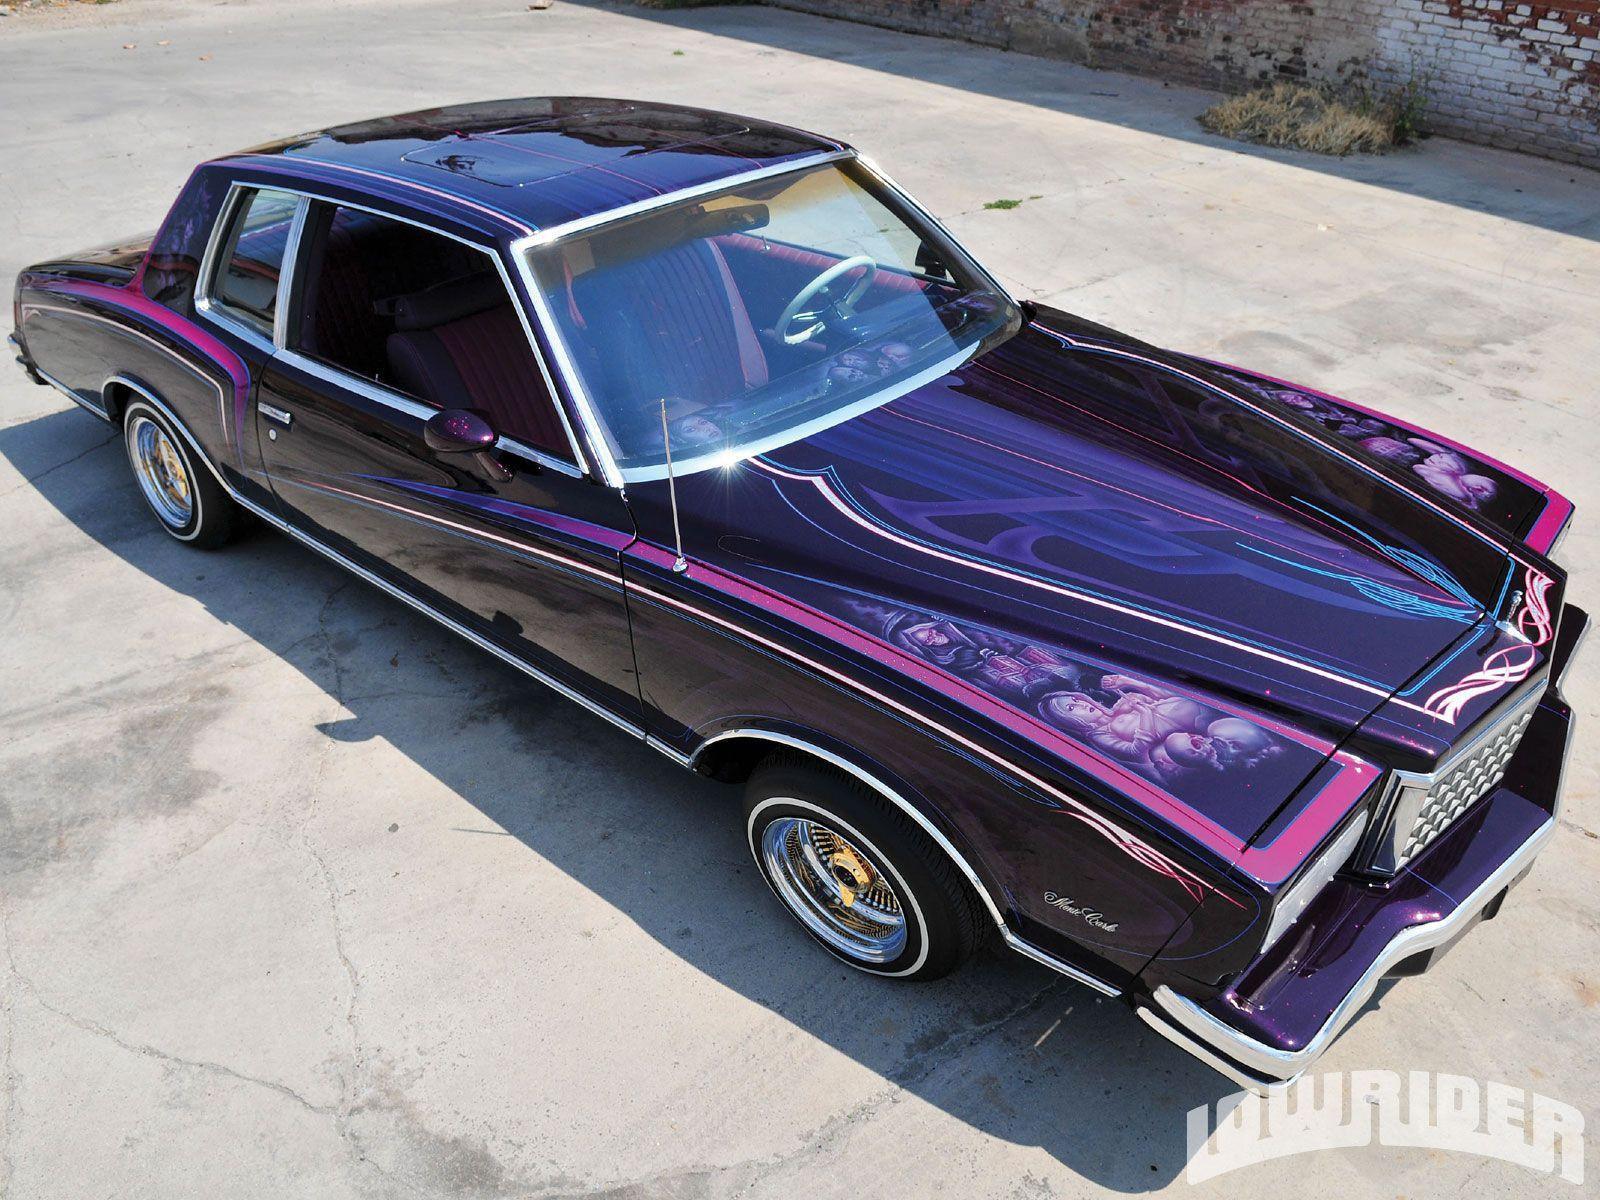 1978 Chevrolet Monte Carlo Lowrider Magazine Chevrolet Monte Carlo Lowriders Lowrider Cars